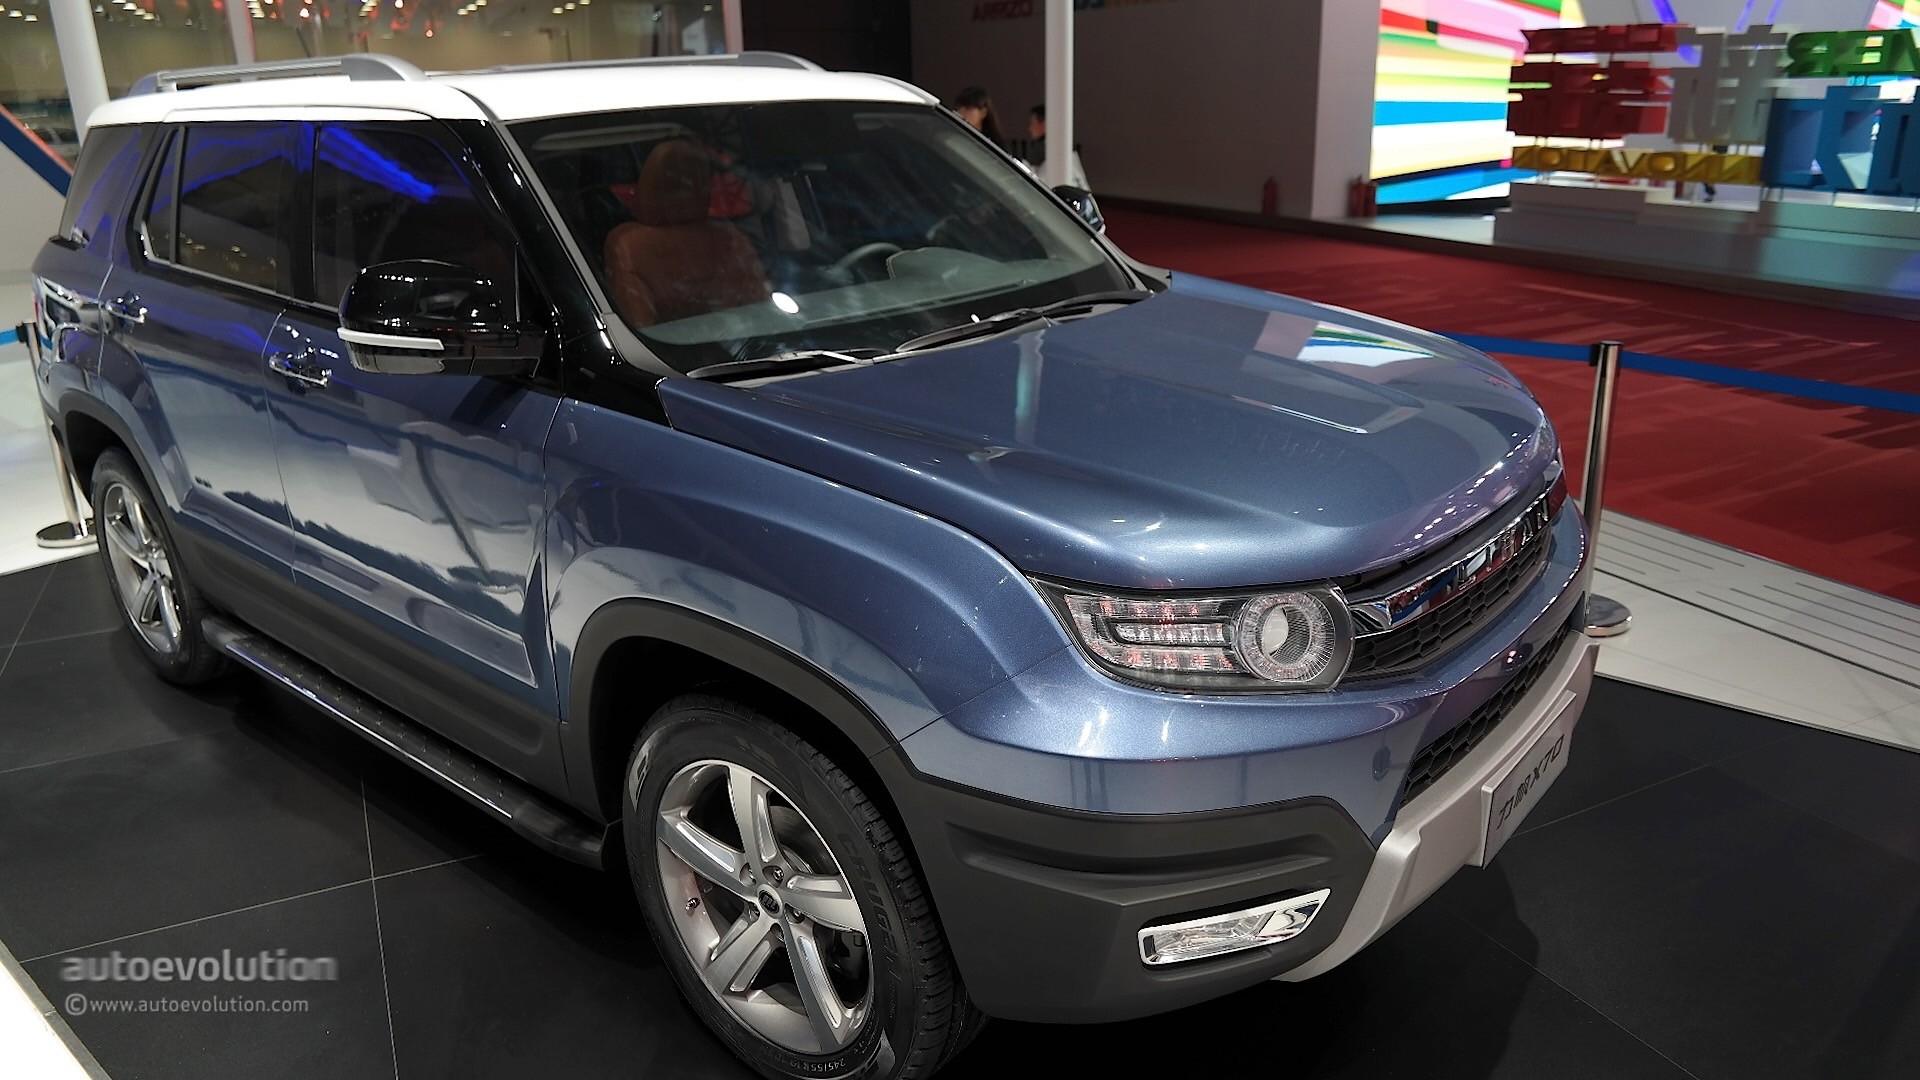 Lifan X70 Suv Concept Takes A Bow At Auto Shanghai 2015